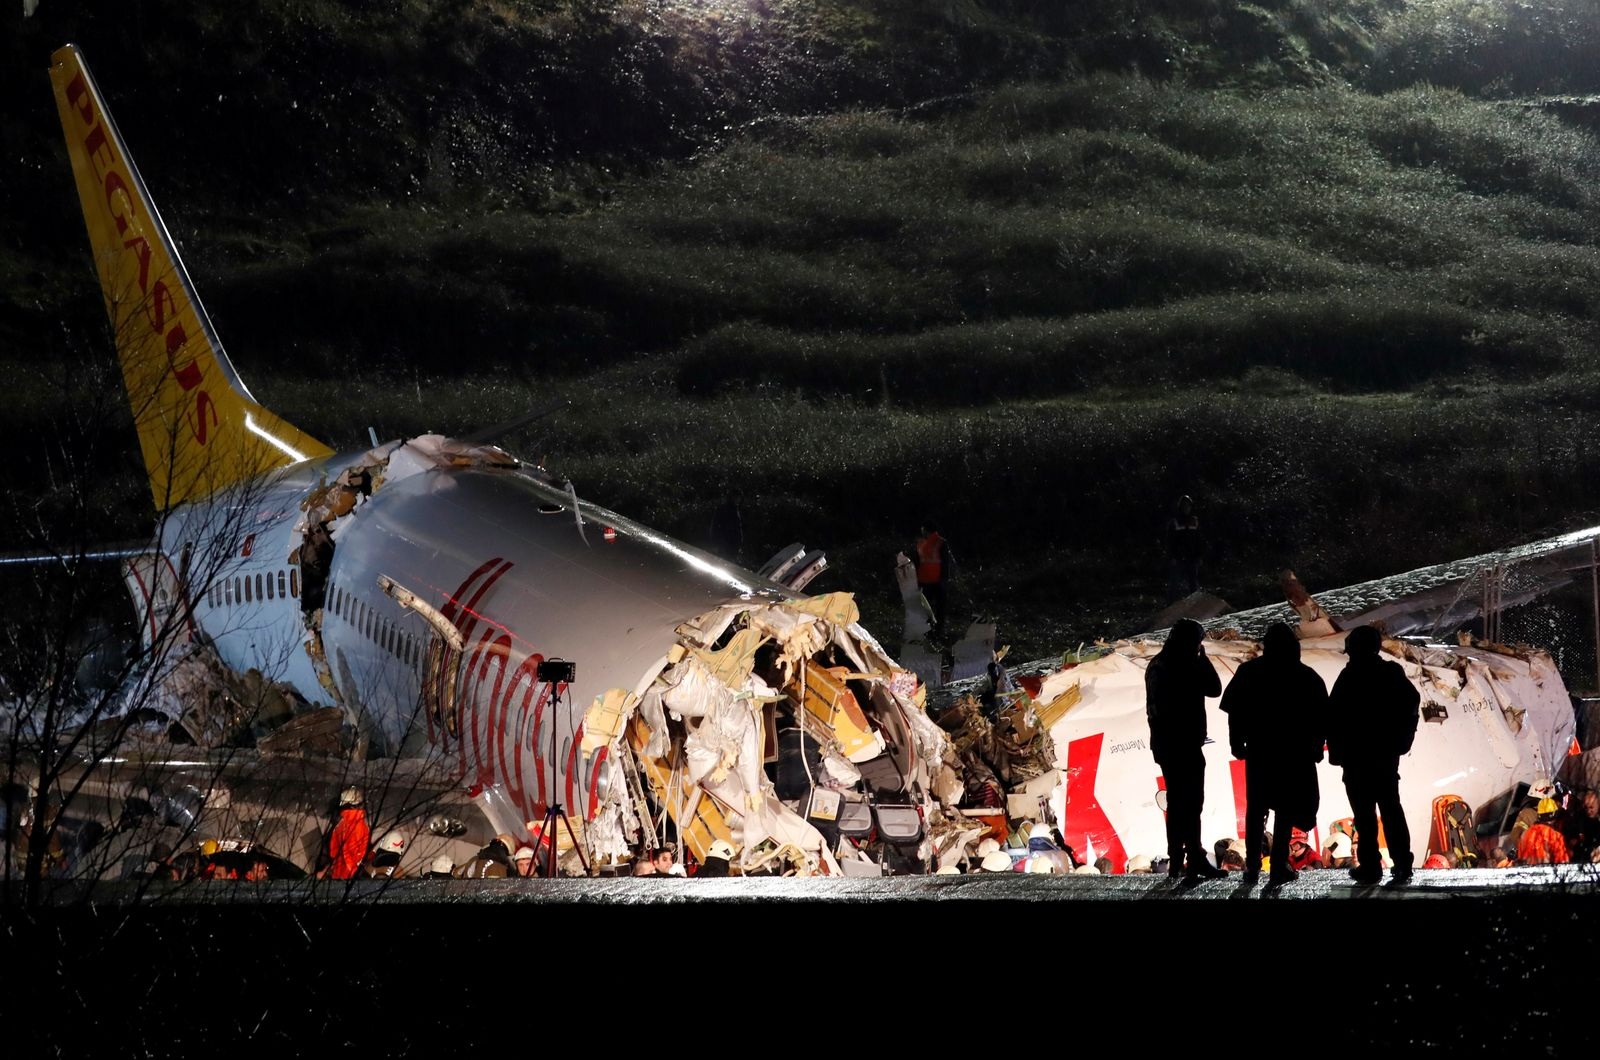 Pegasus Airlines plane overruns runway and crashes at Istanbul's Sabiha Gokcen airport